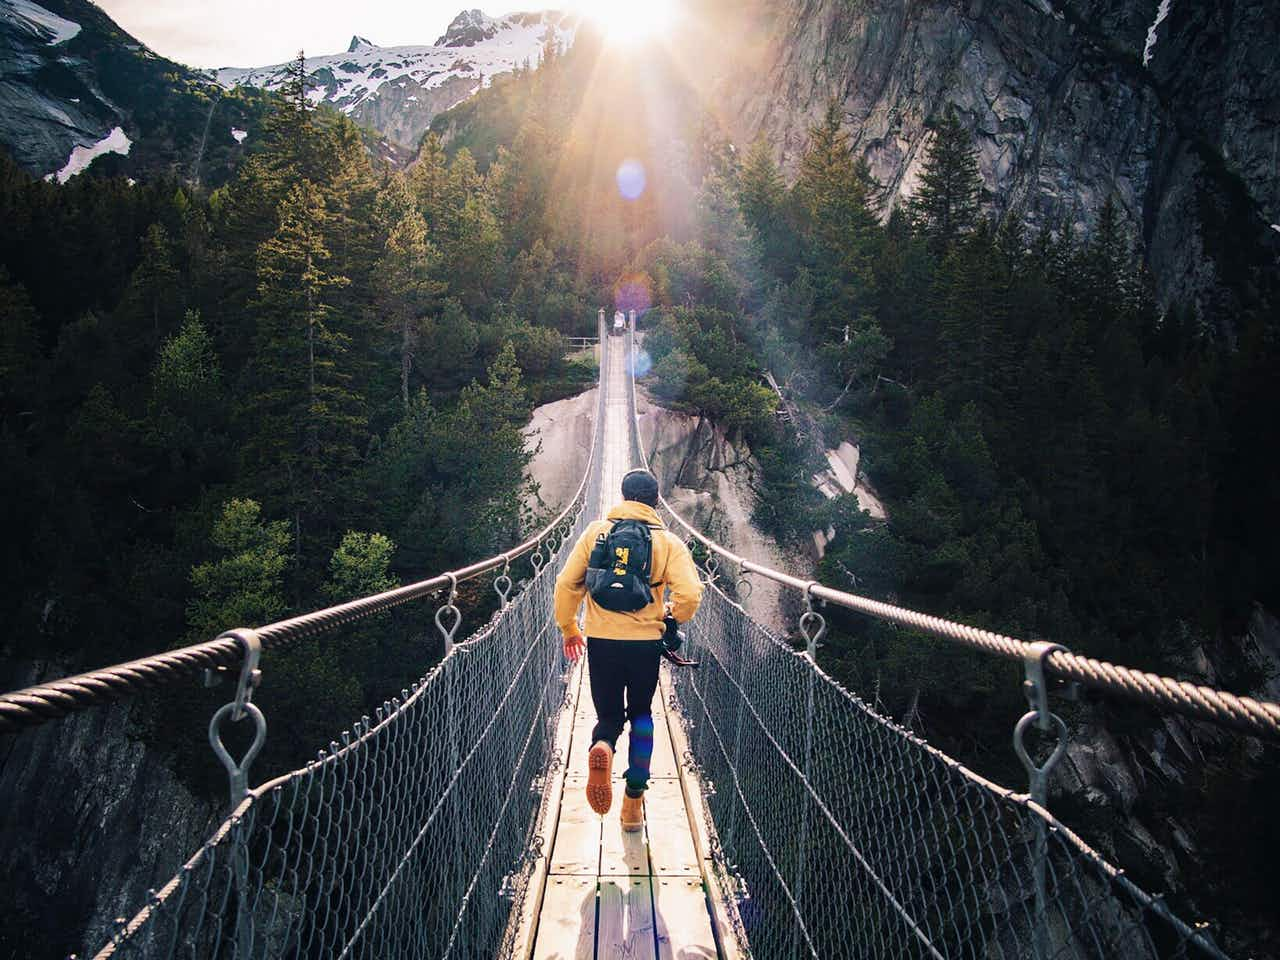 Brücke Berge Outdoor Abenteuer